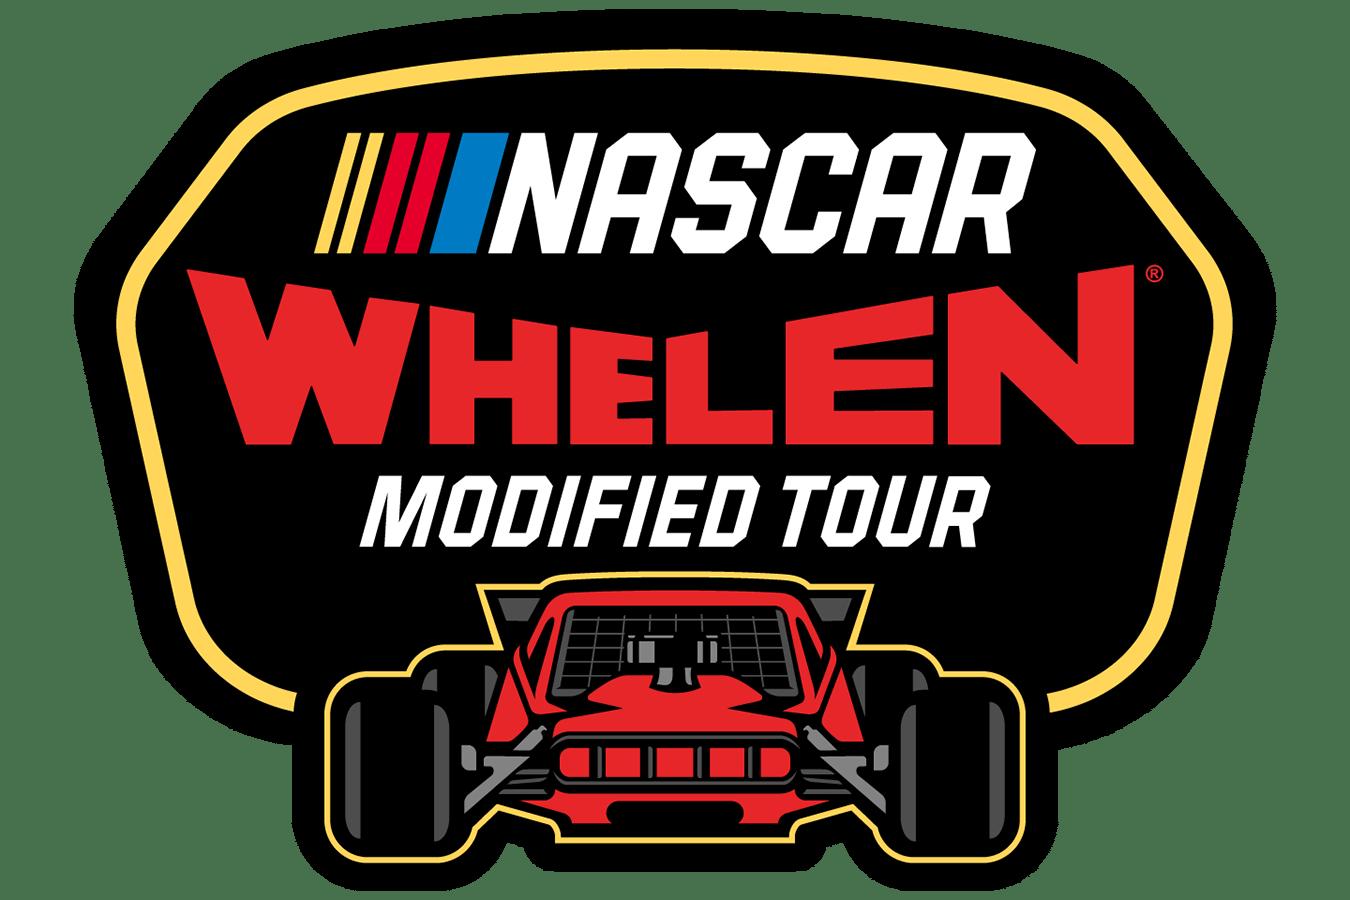 Race car tire clipart banner freeuse stock Whelen Modified Tour – NASCAR Home Tracks banner freeuse stock